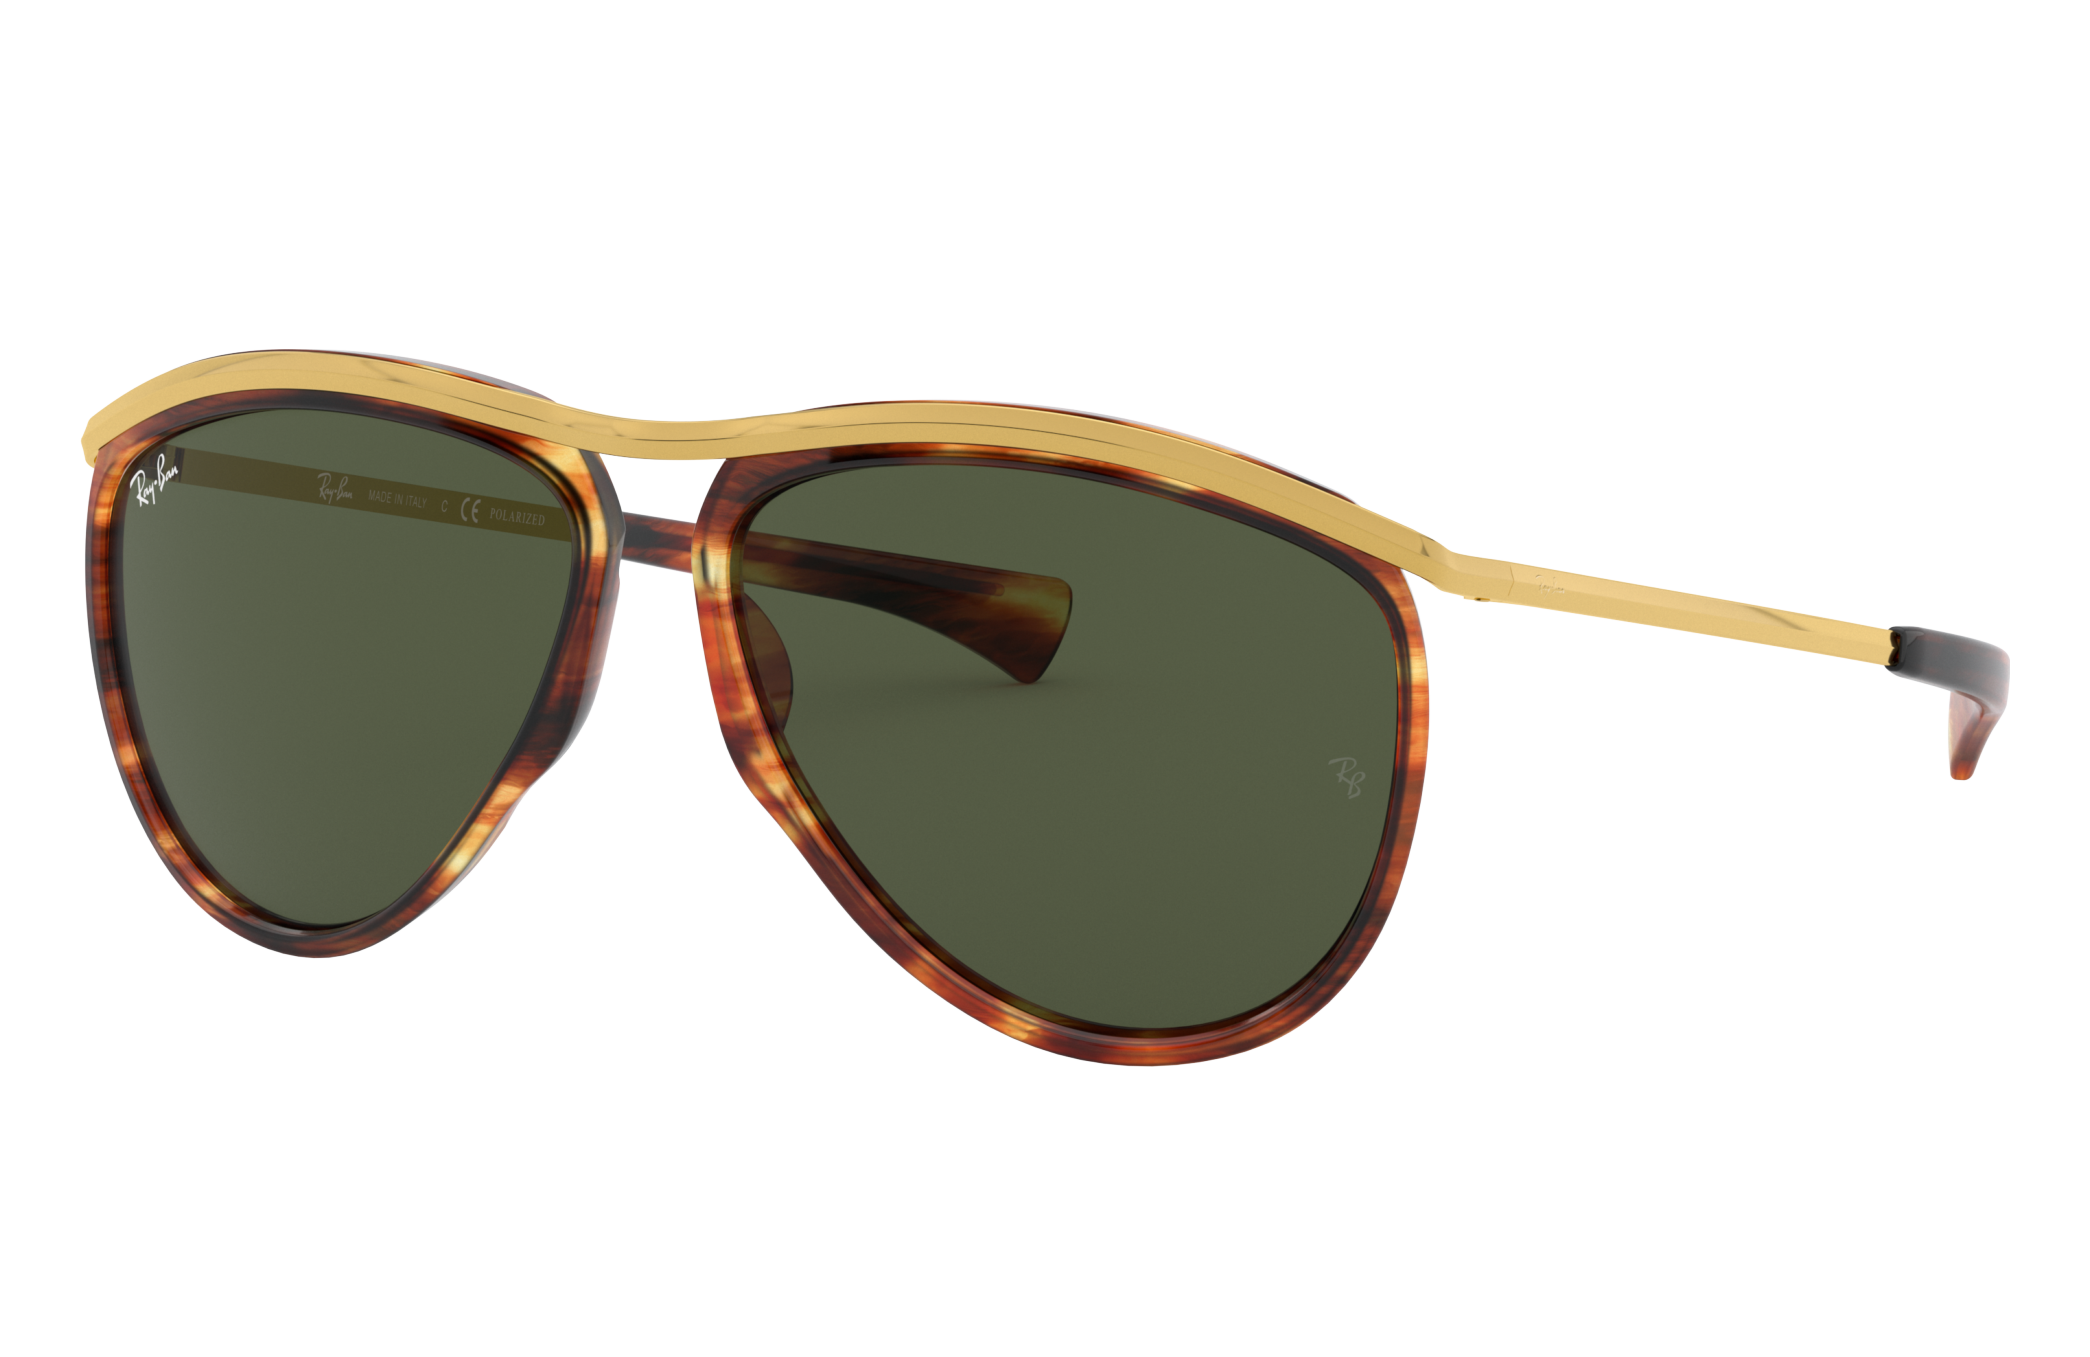 Ray-Ban Aviator Olympian Gold, Green Lenses - RB2219